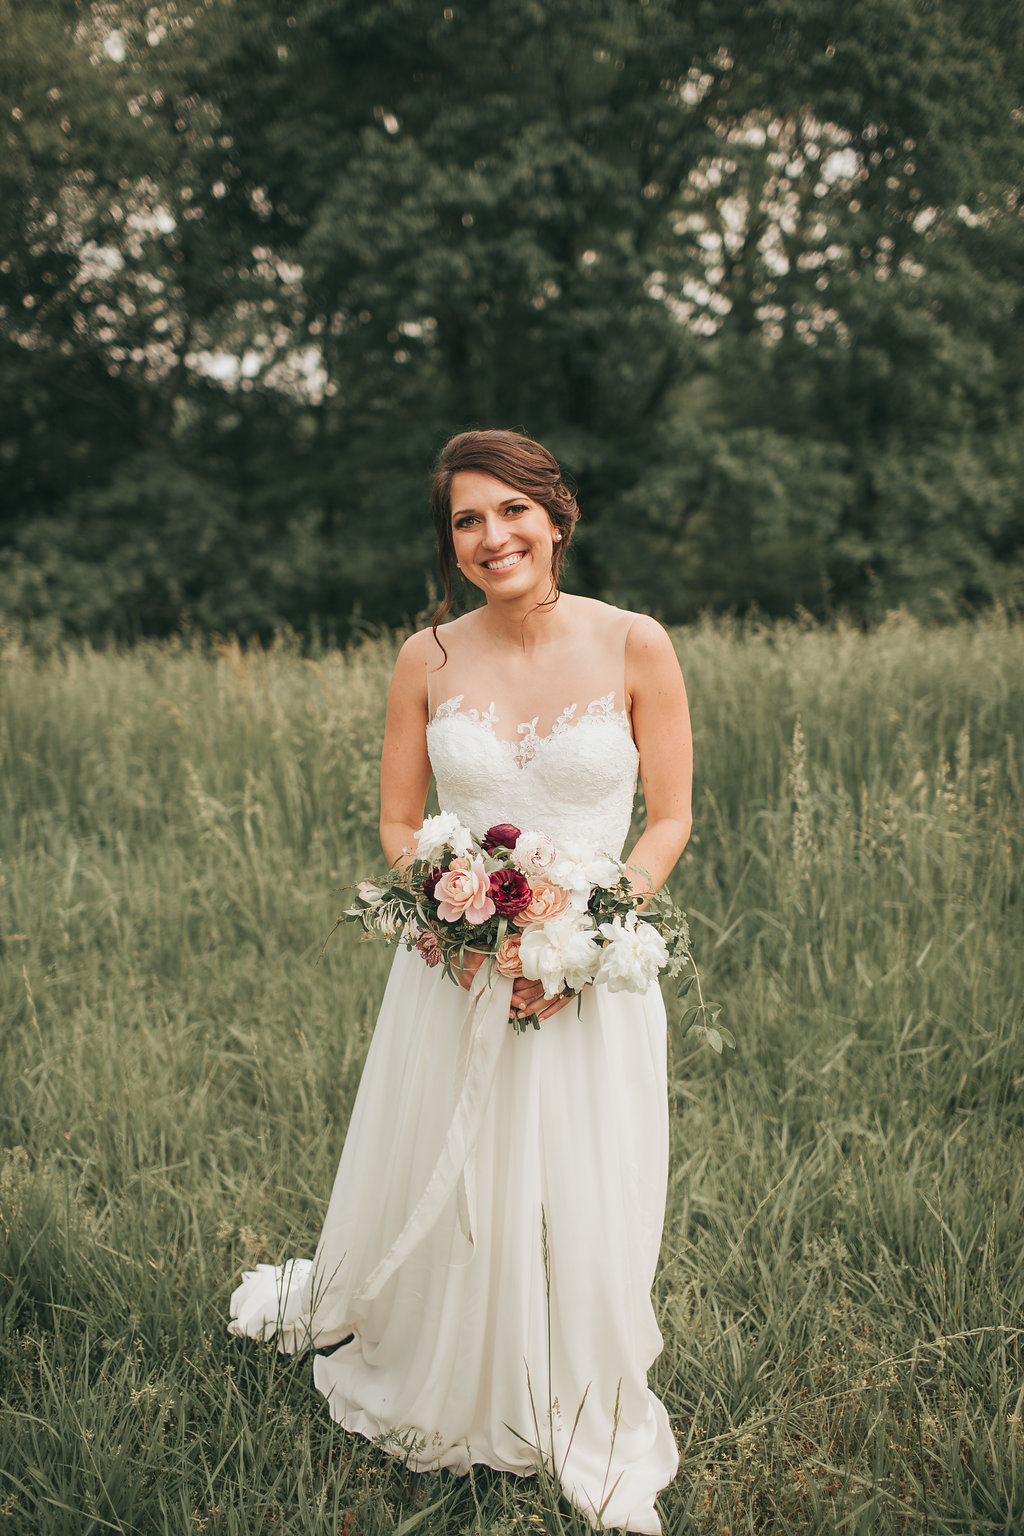 Megan & Aaron    Photography by  Brandi Sisson